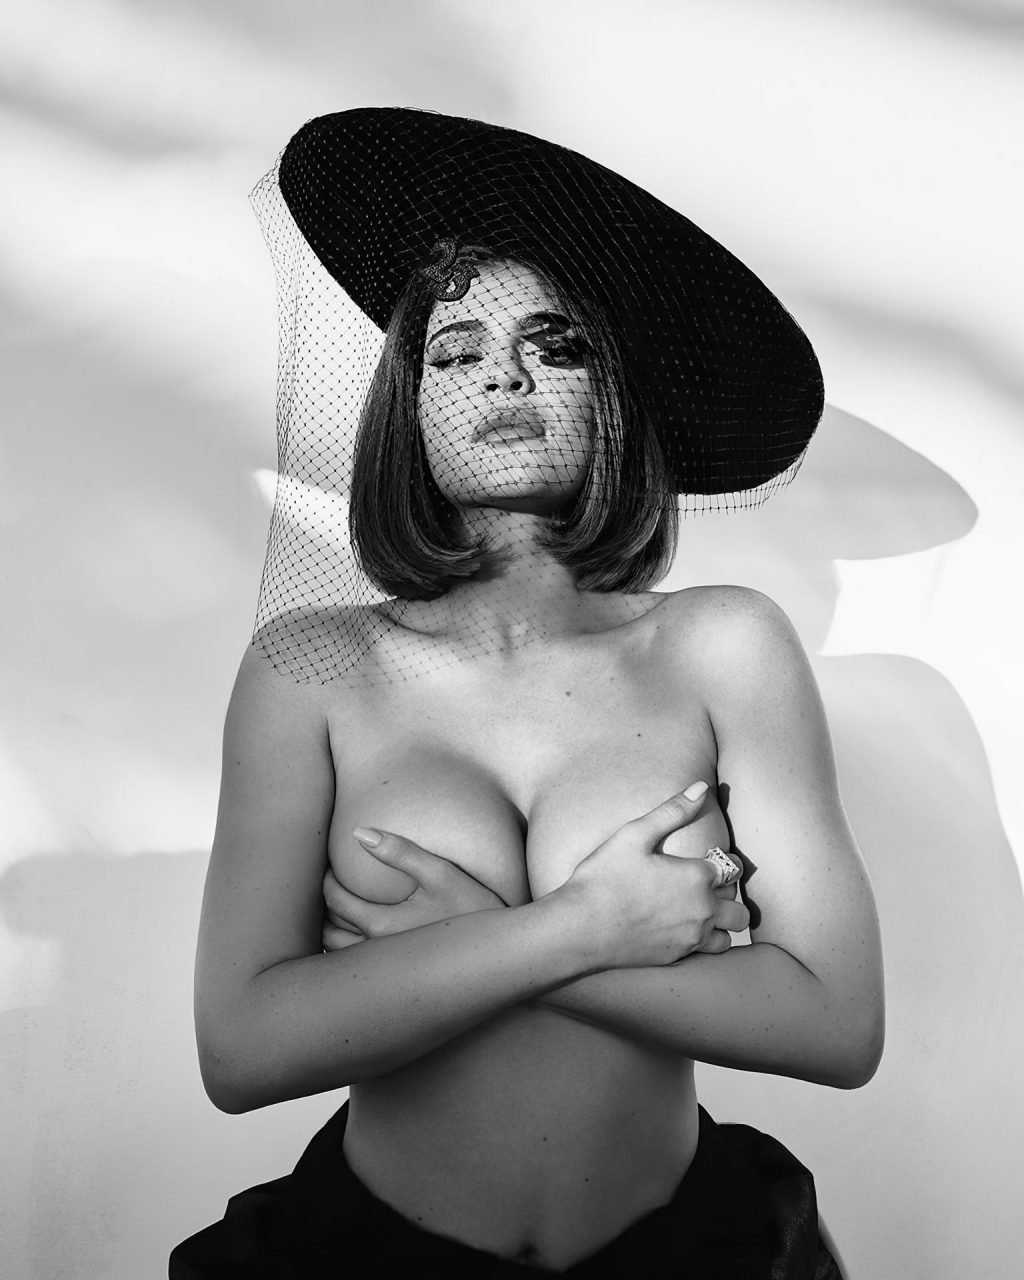 Kylie Jenner Hot (2 New Photos)